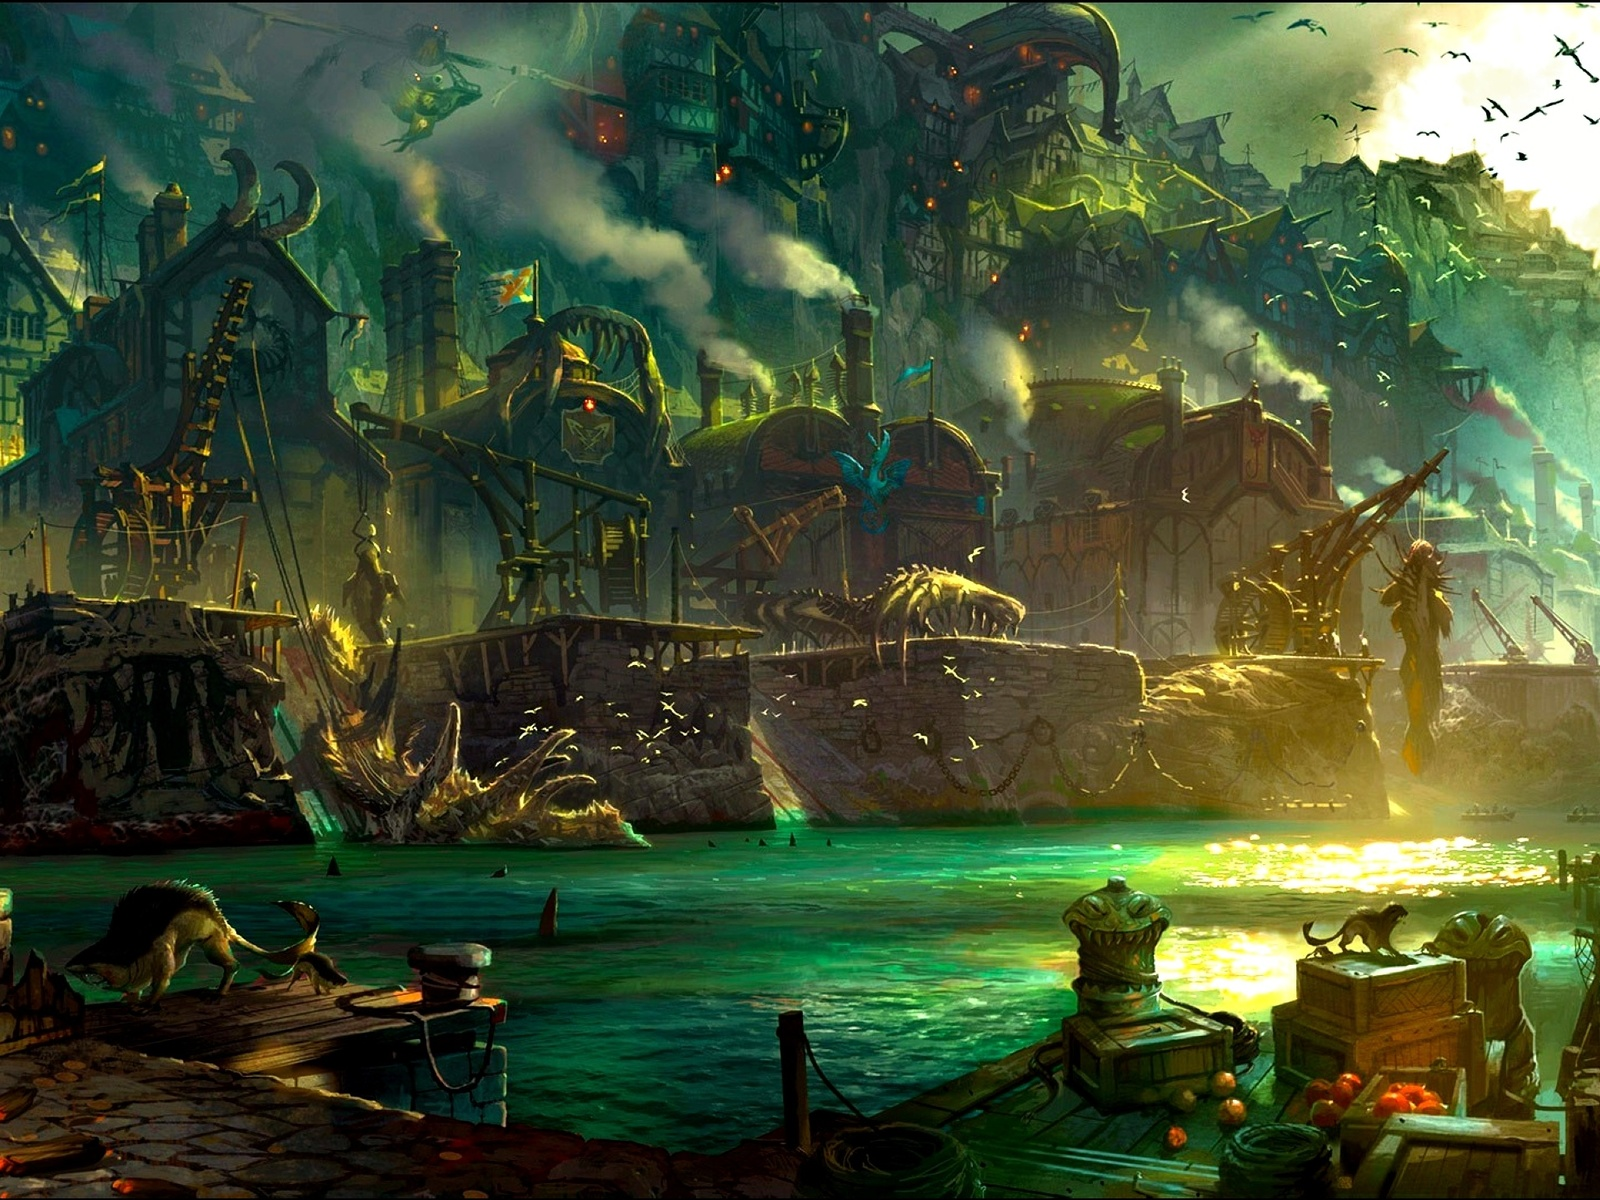 джунгли, мифология